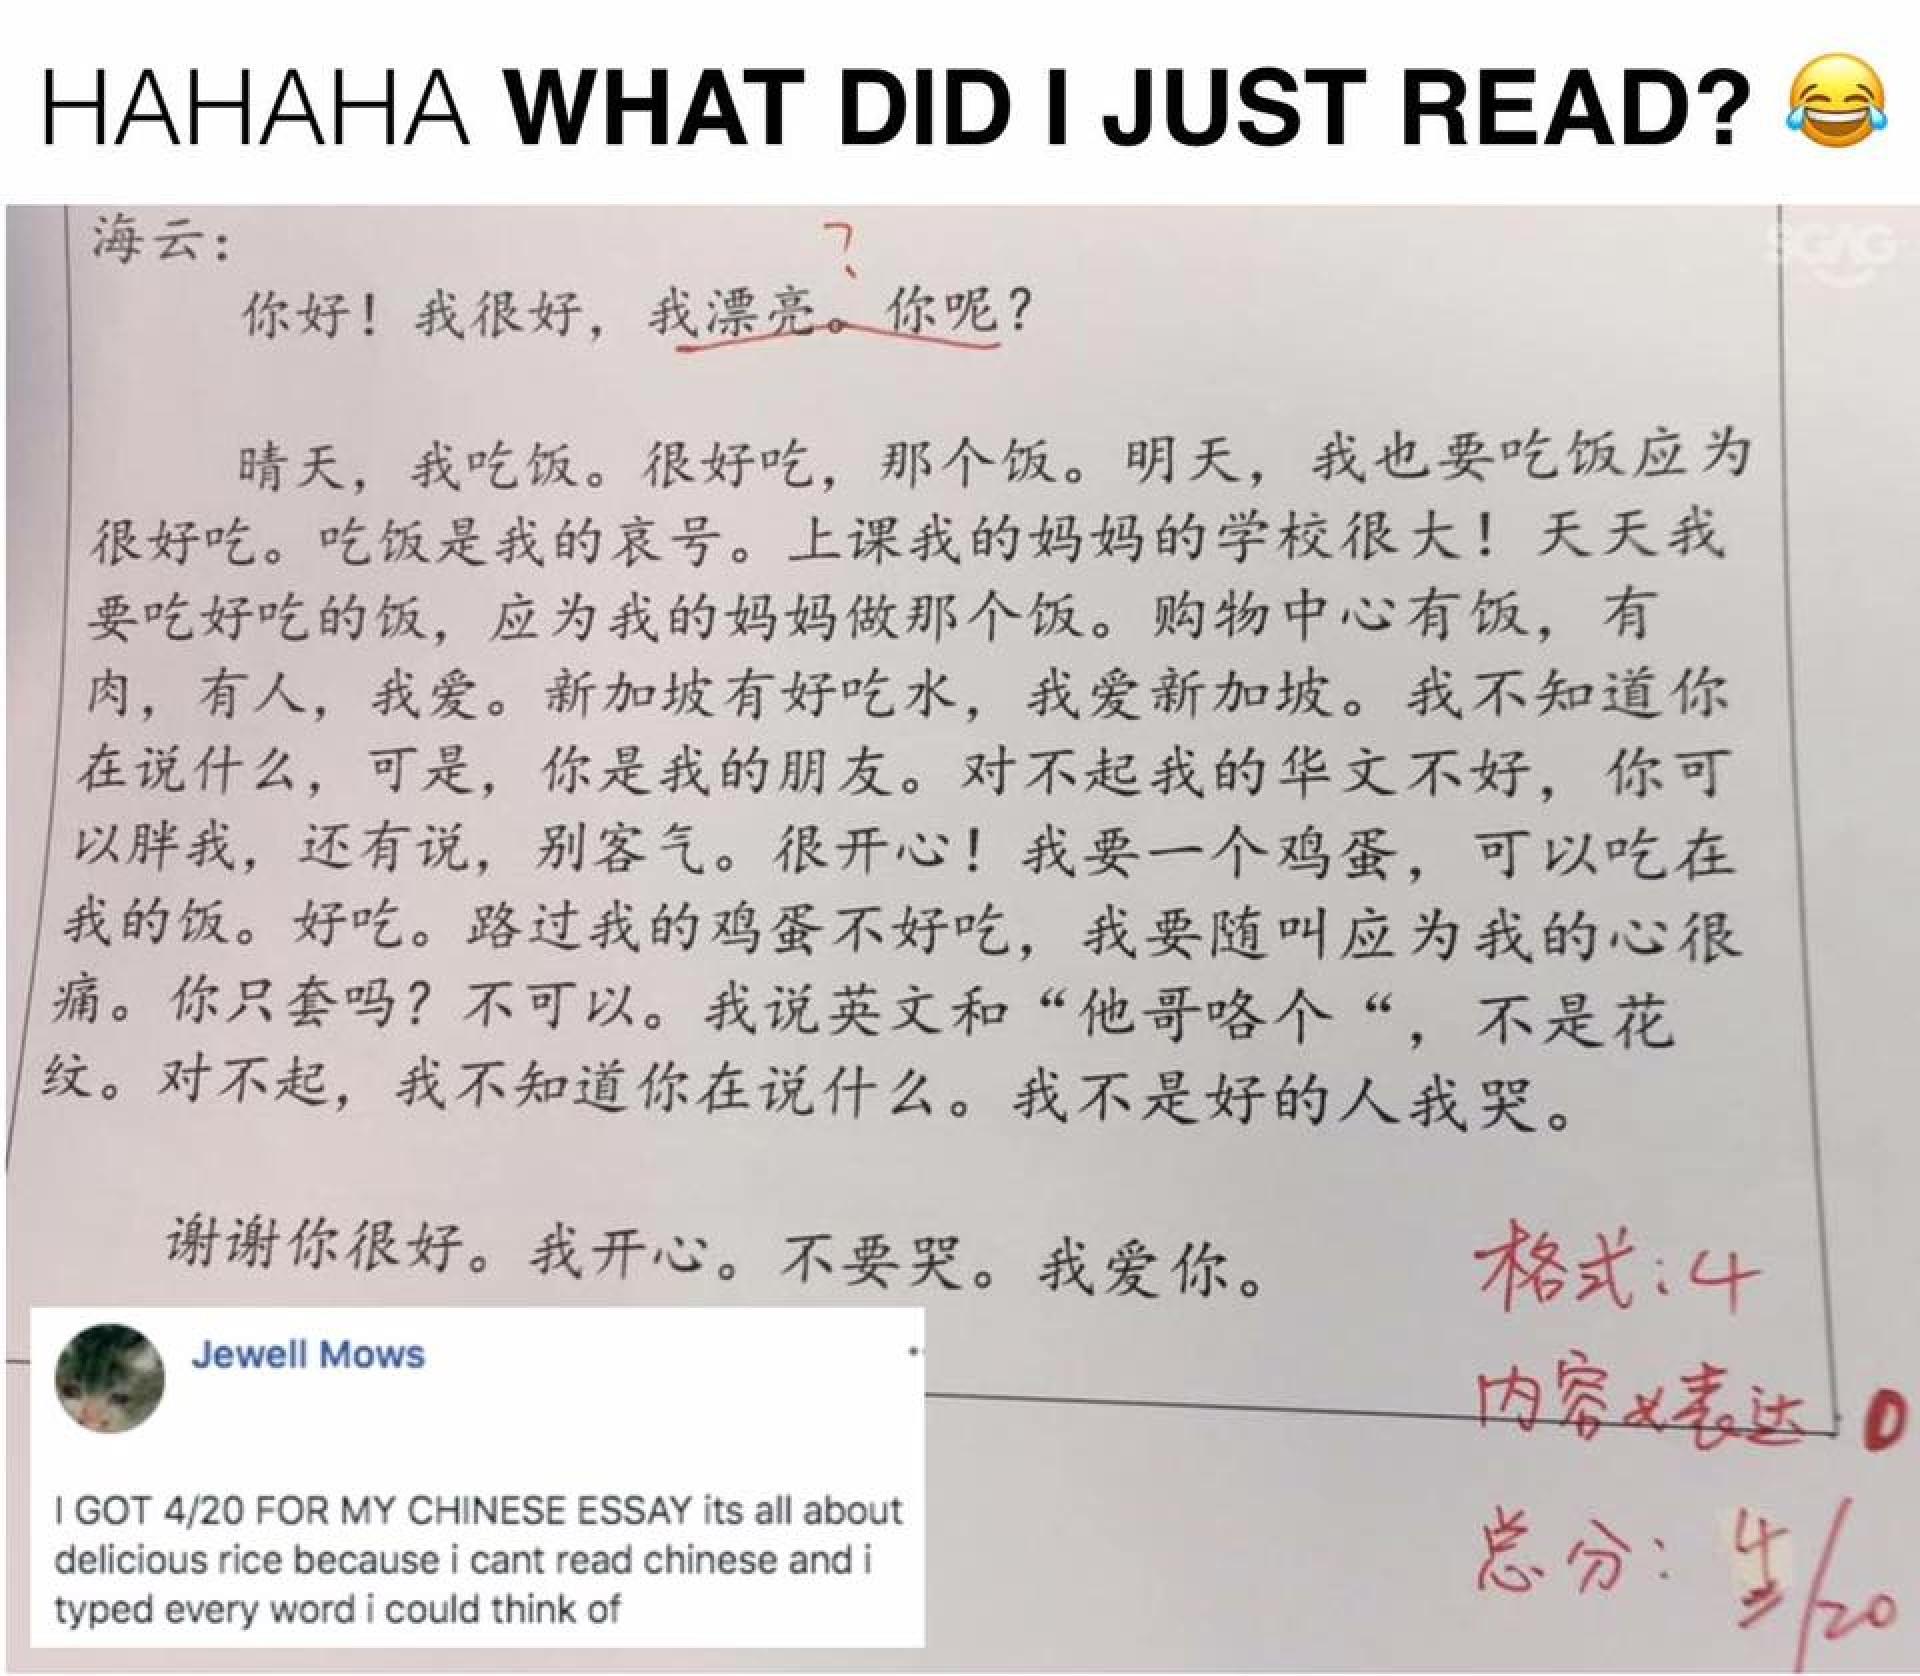 007 449y258ku5921 Essay Example Amazing Chinese Language Writing Letter Format Topics 1920